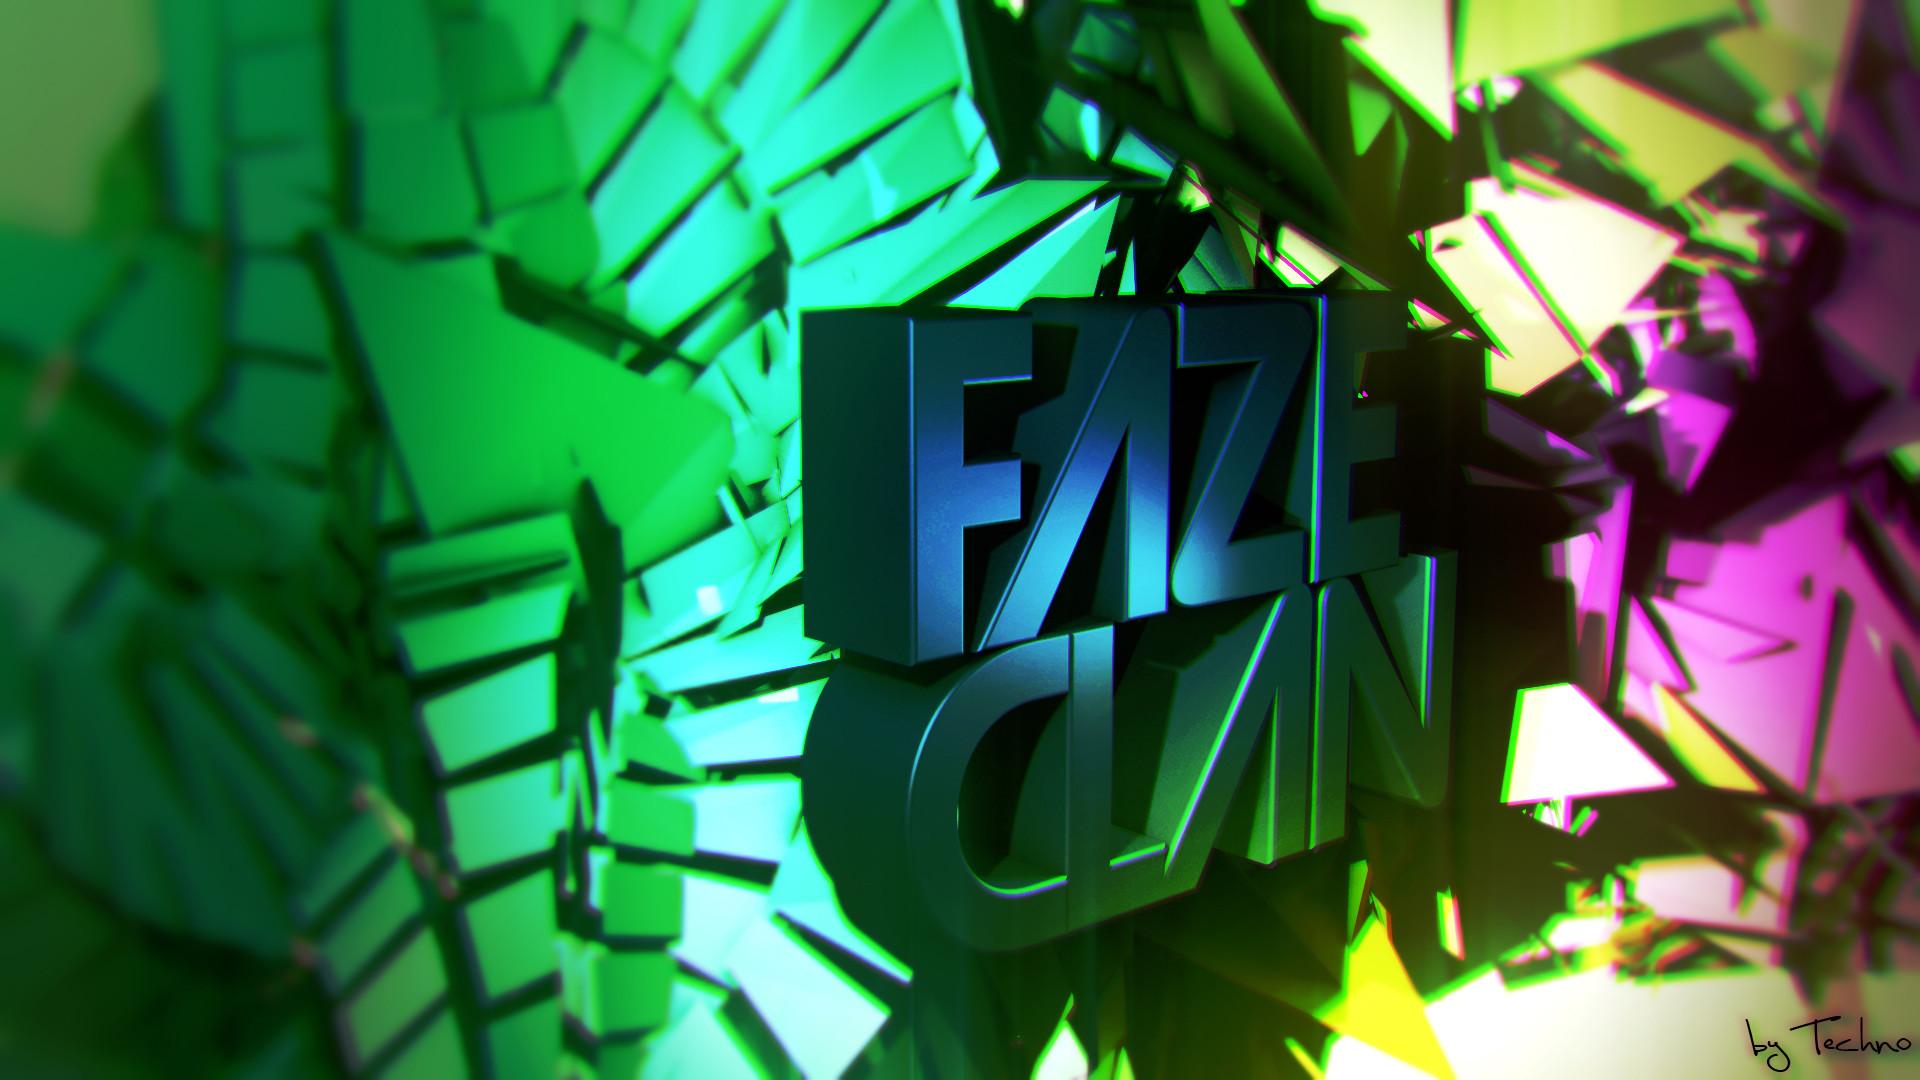 White Faze Clan Desktop Background for Pinterest